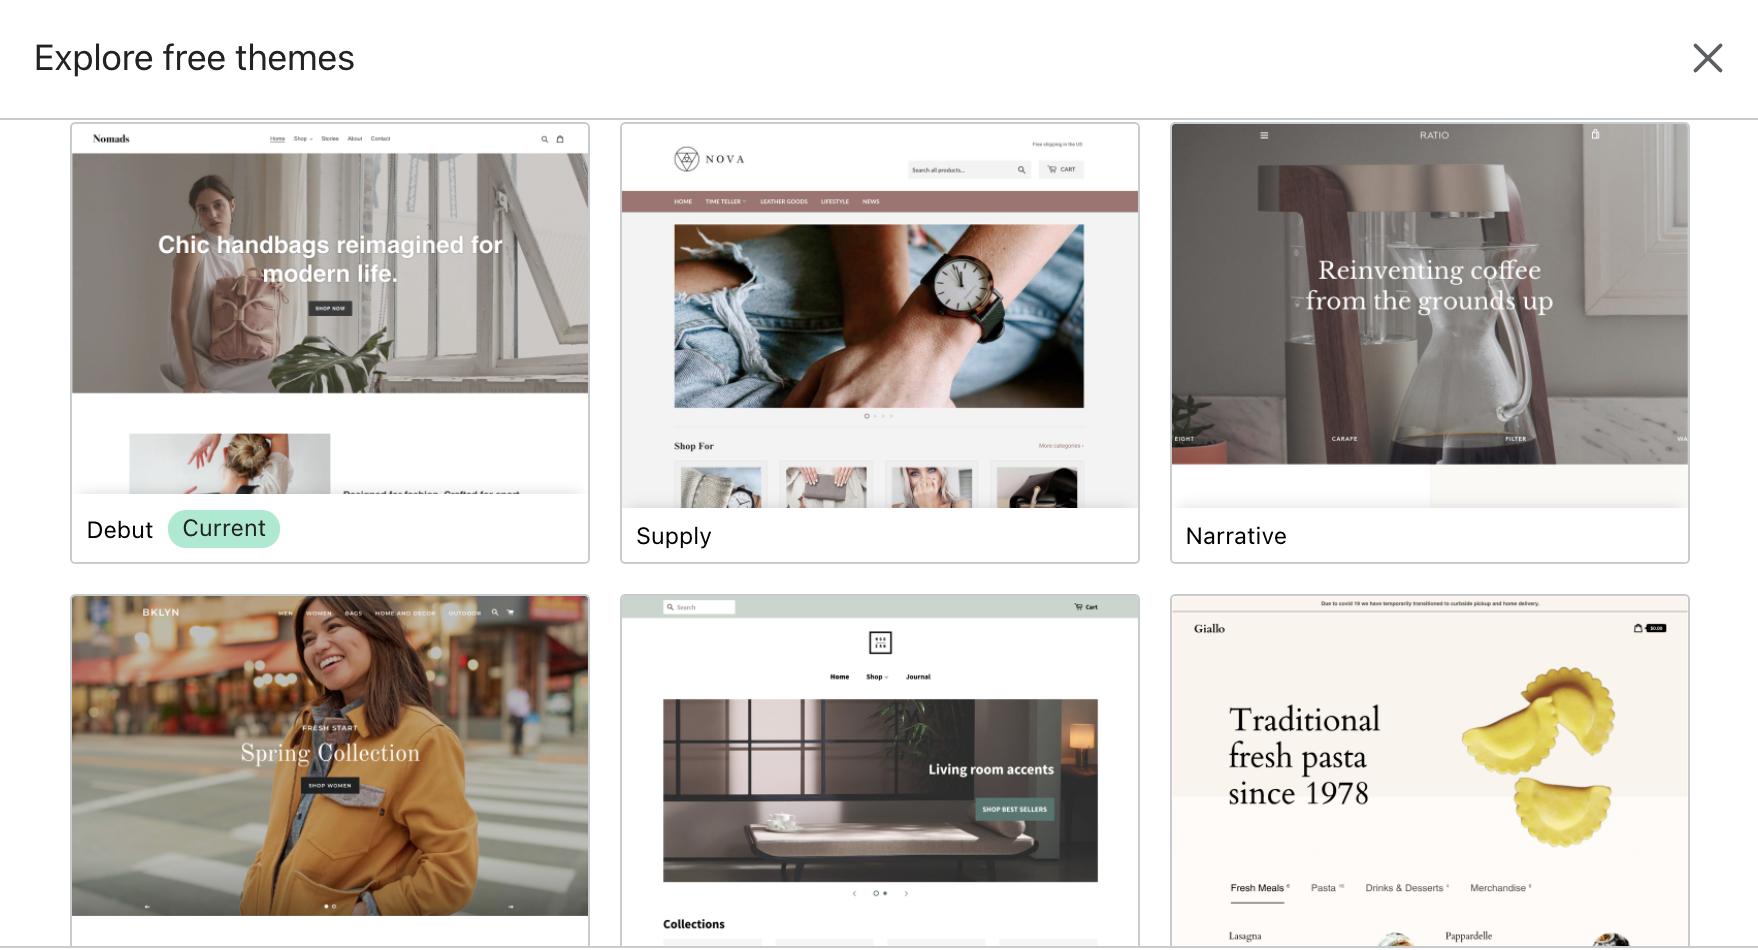 shopify themes wordpress vs shopidy for ecommerce